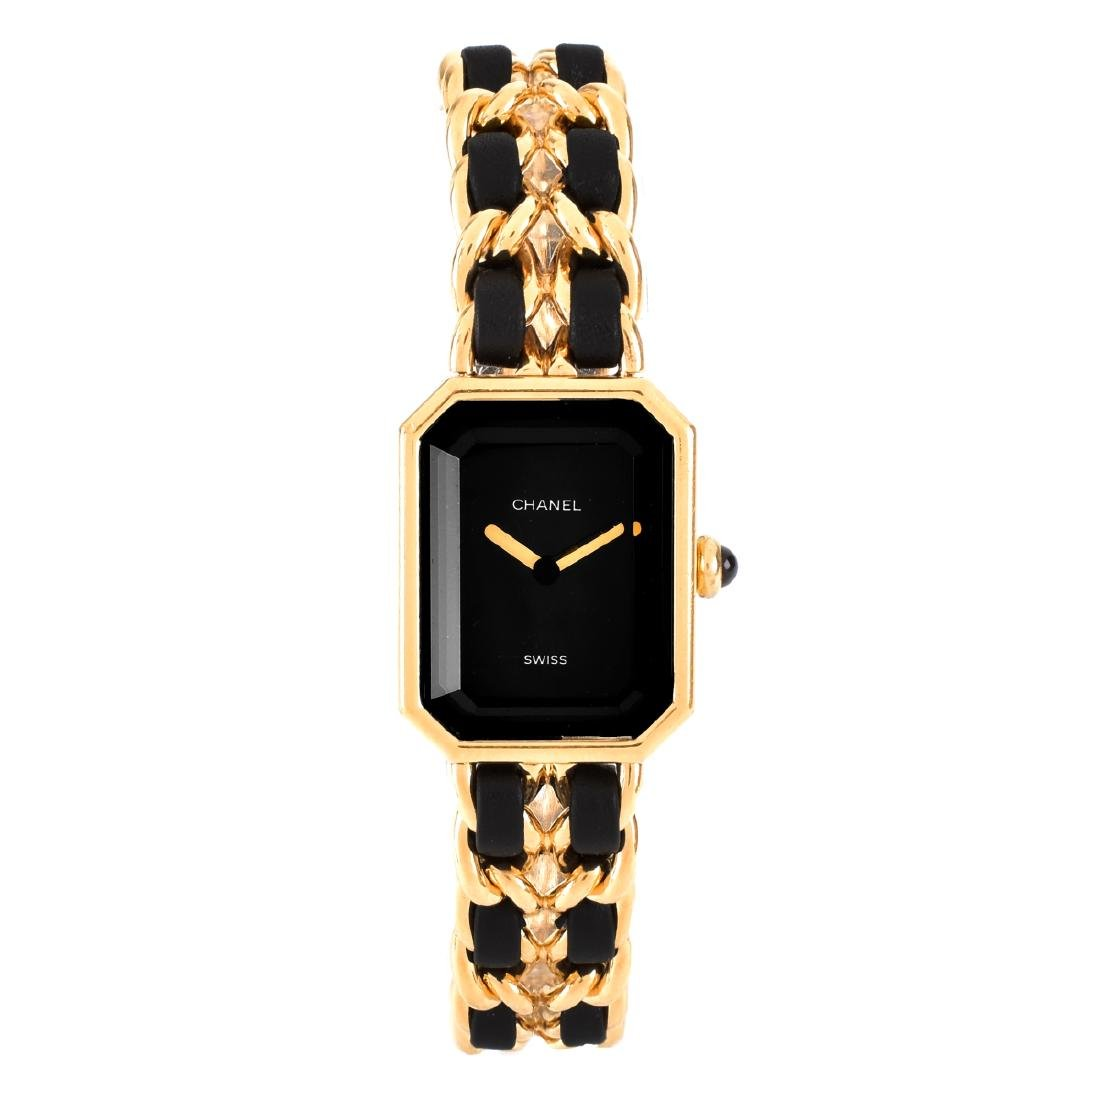 Chanel Premiere XL Watch